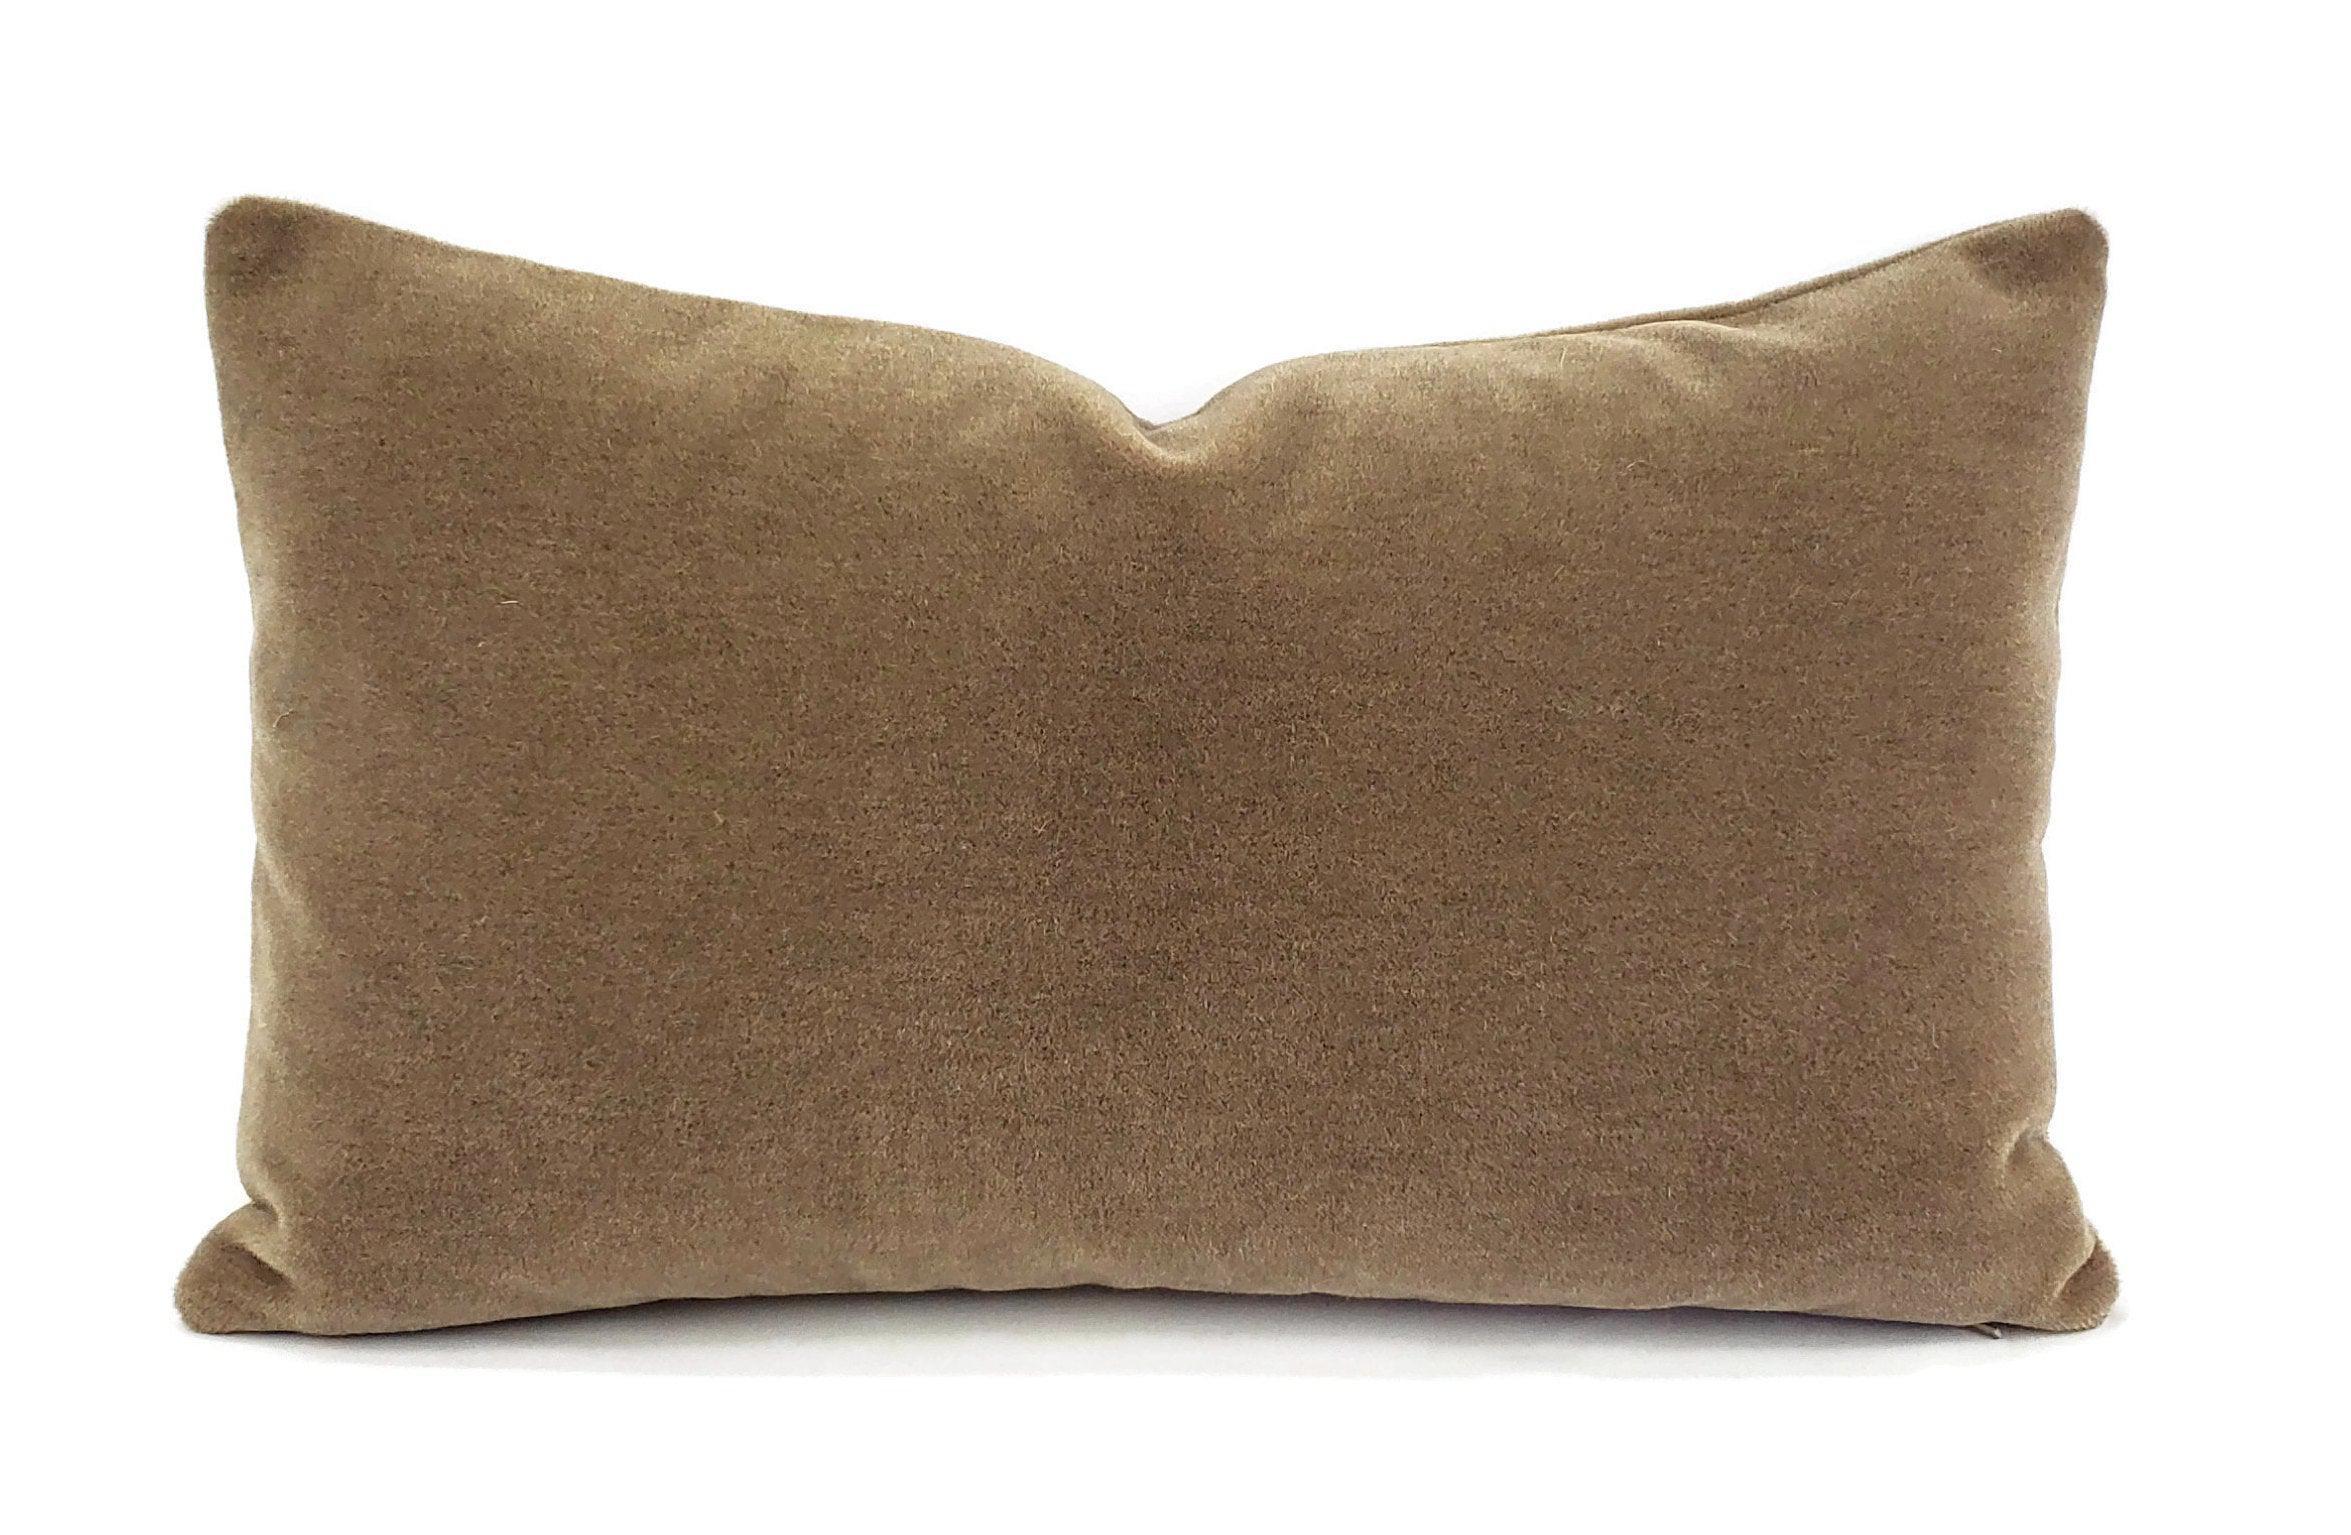 maharam mohair supreme in stonehenge lumbar pillow cover 12 x 20 solid stone brown mohair velvet rectangle cushion case